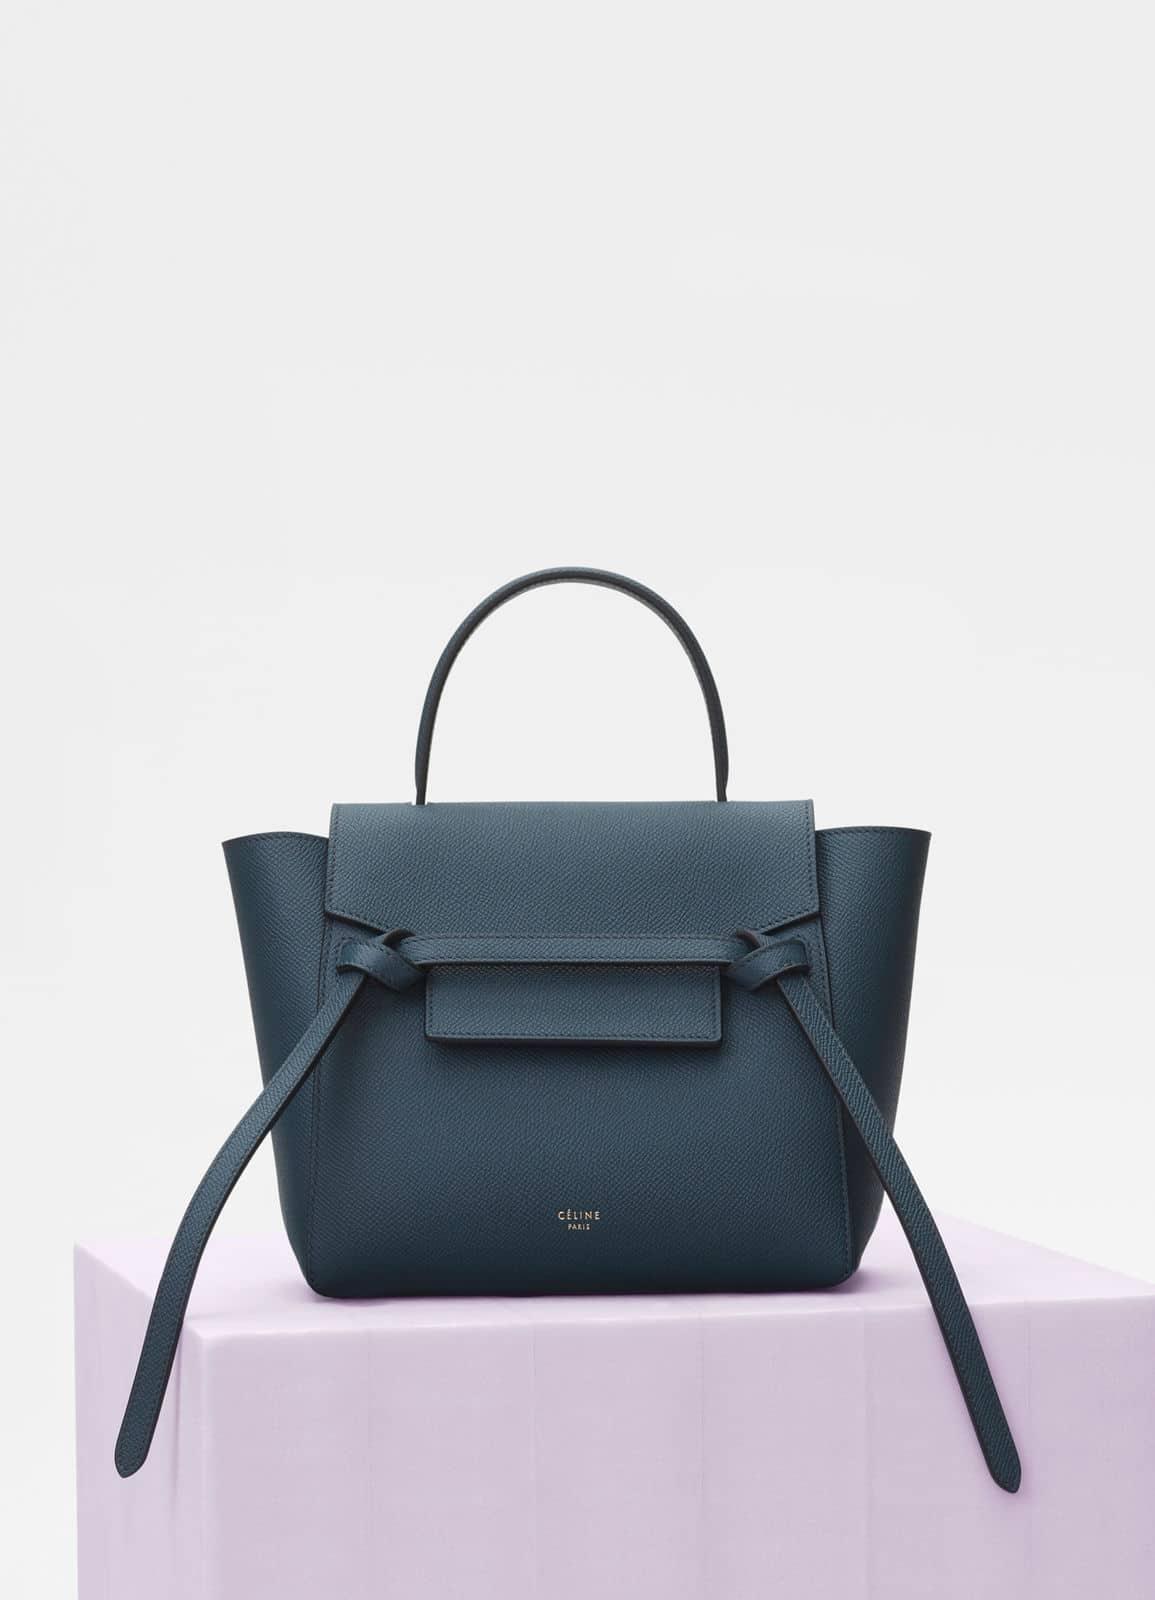 Celine Bag Nano Belt Bag Sema Data Co Op